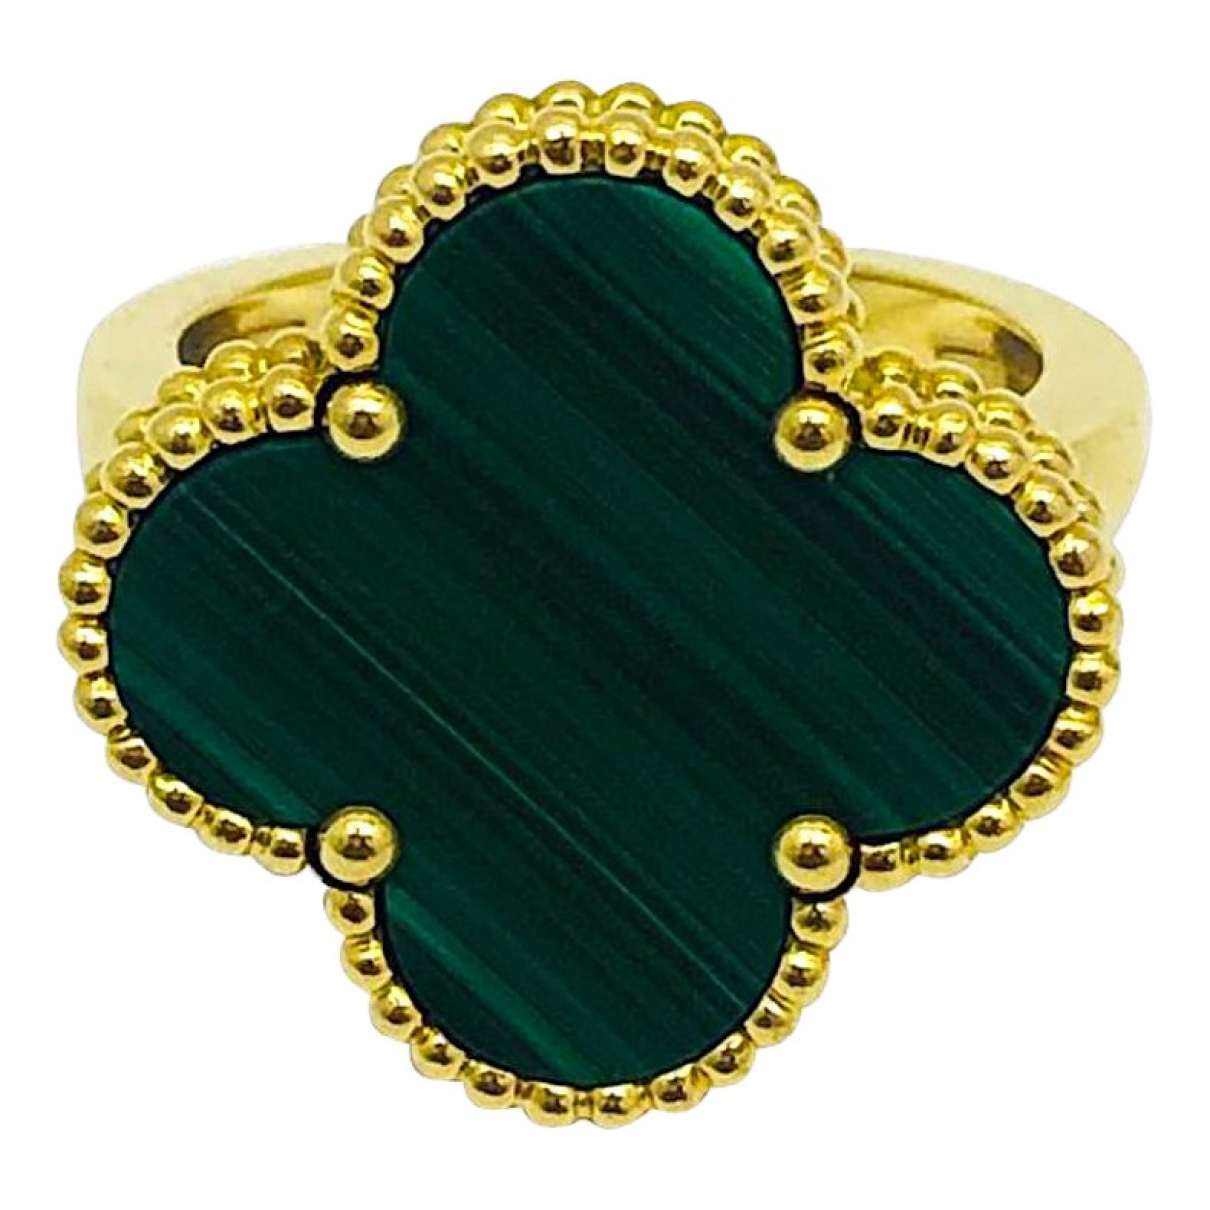 Van Cleef & Arpels - Bague Magic Alhambra pour femme en or jaune - vert